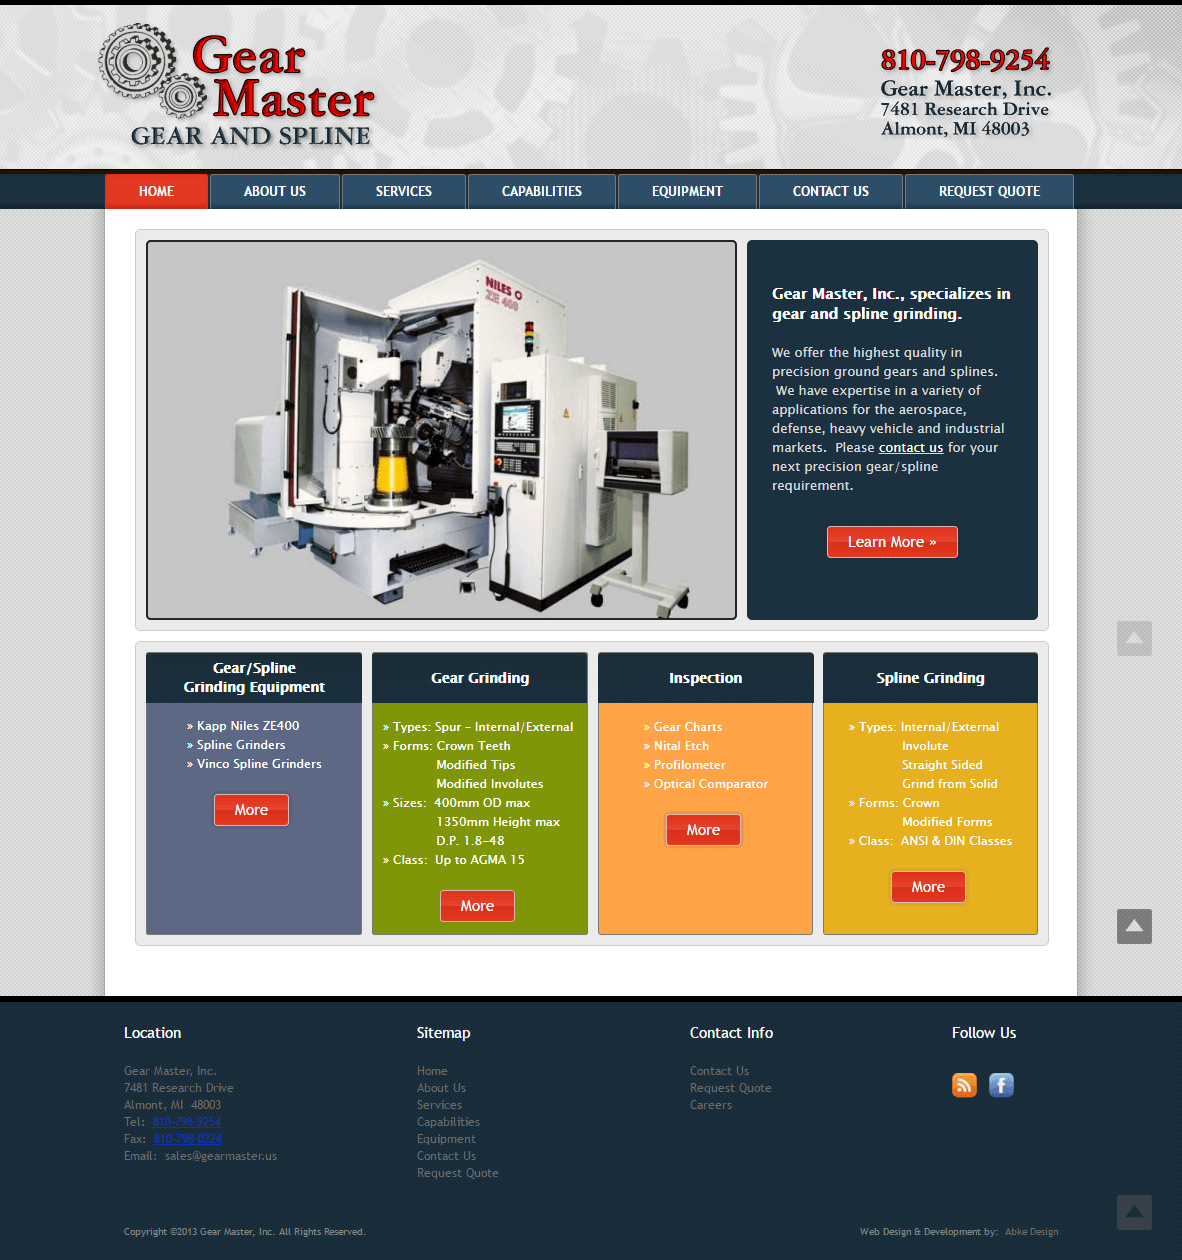 Gear Master - Website Design & Development by Abke Design